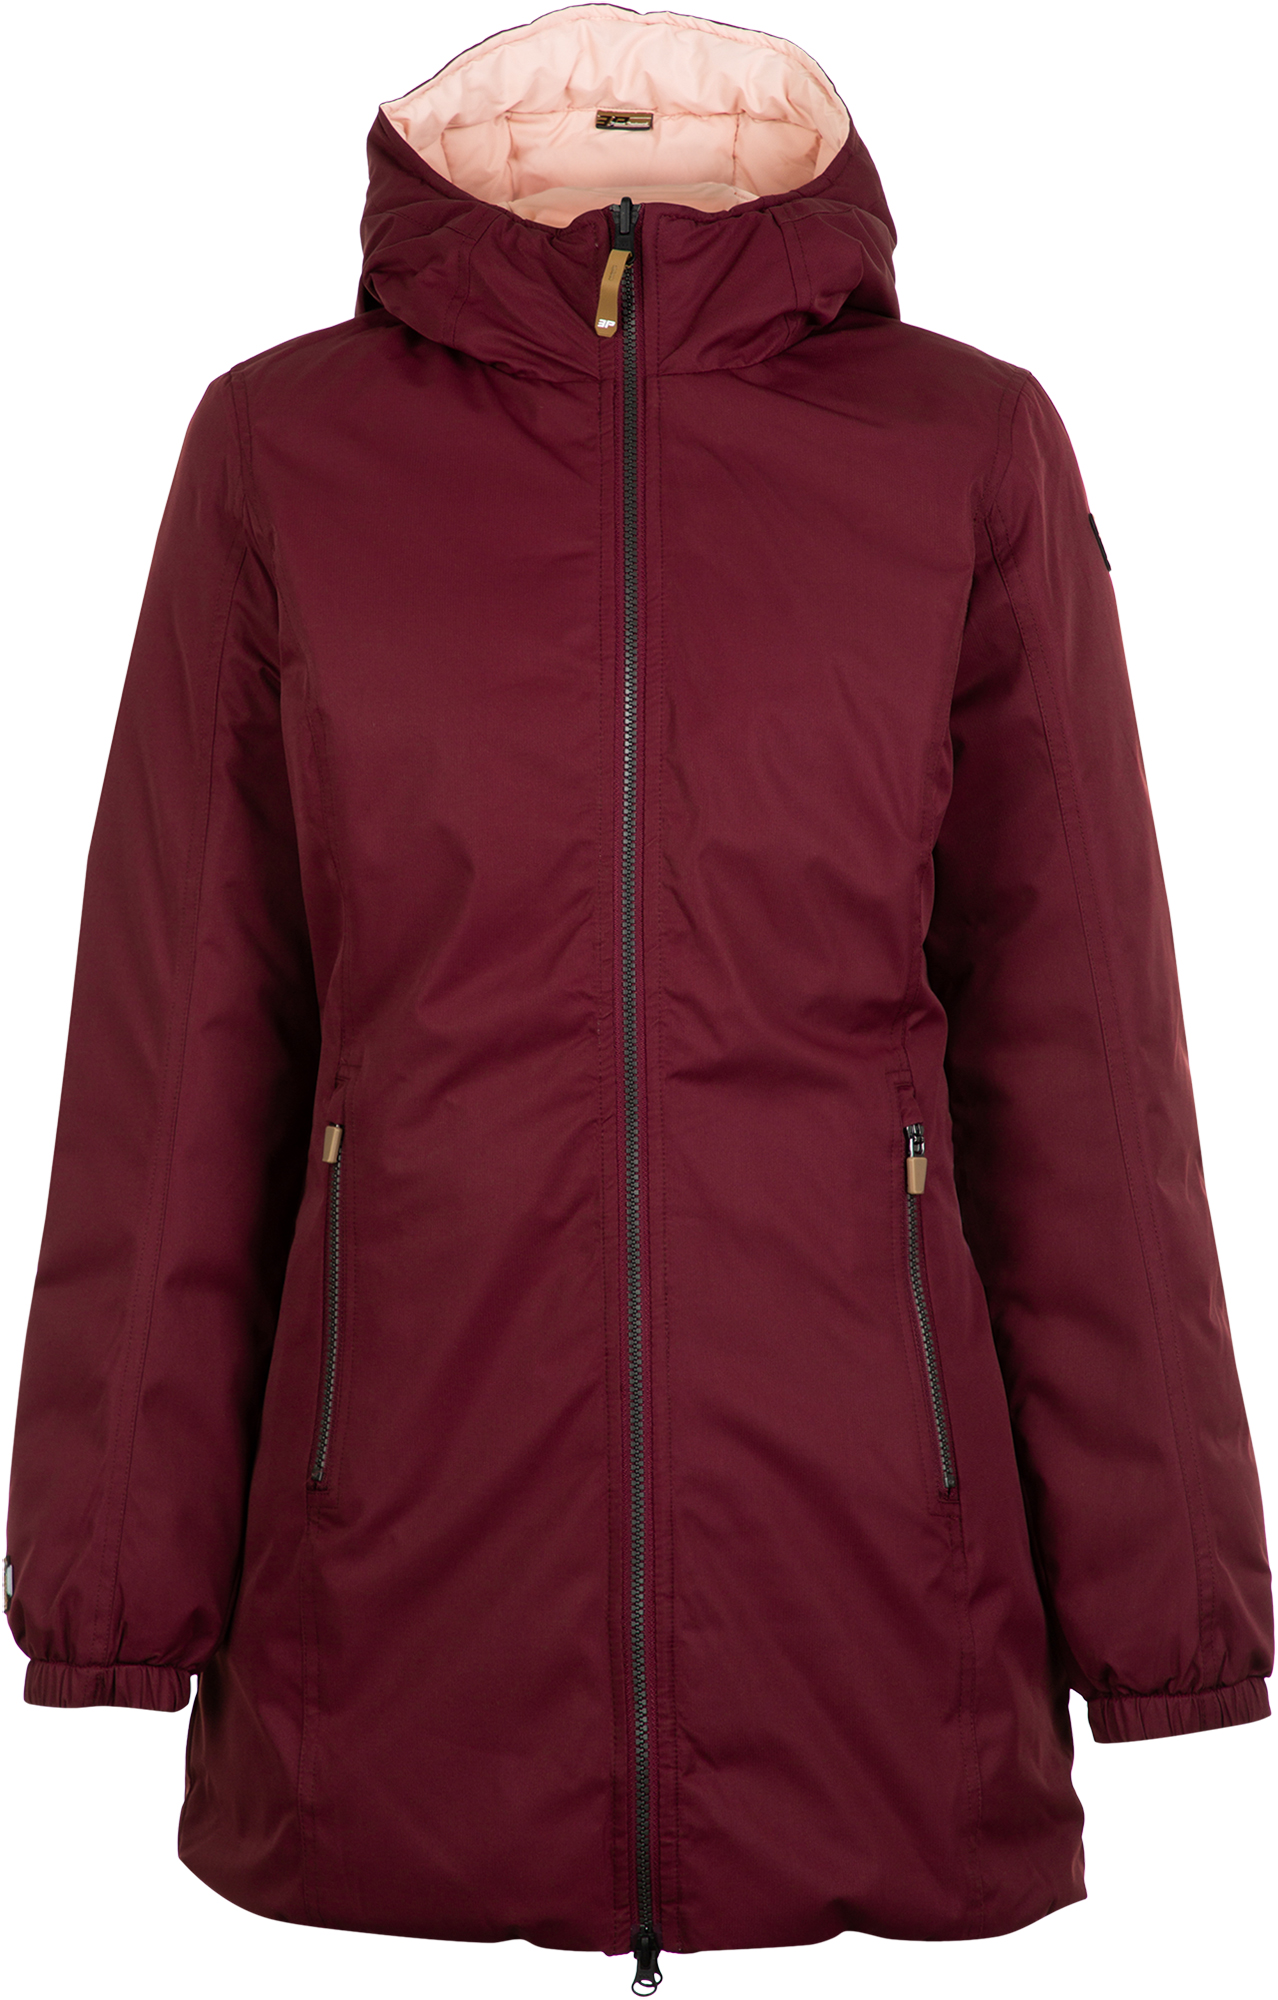 IcePeak Куртка утепленная женская Philippi, размер 52